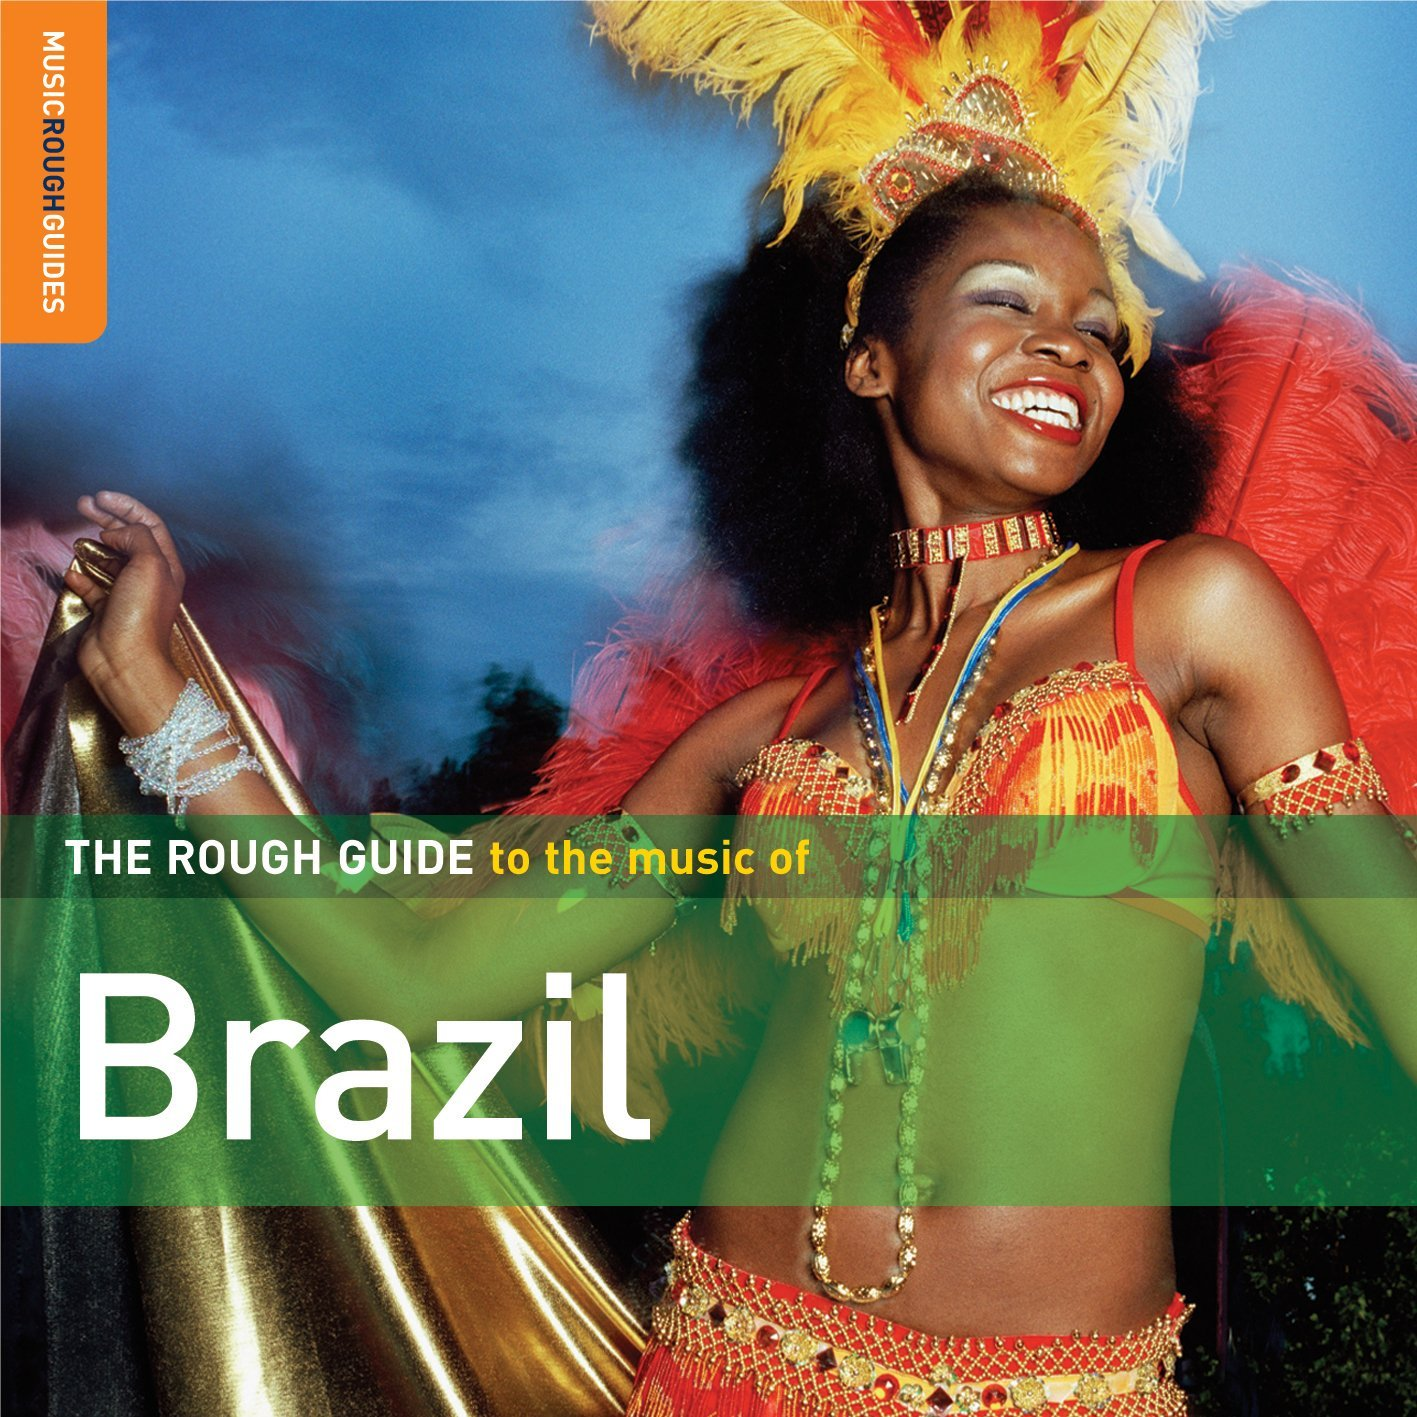 Brazilian Music RGNET1188CD  Rough Guide World Music CD  Muziek Brazilië